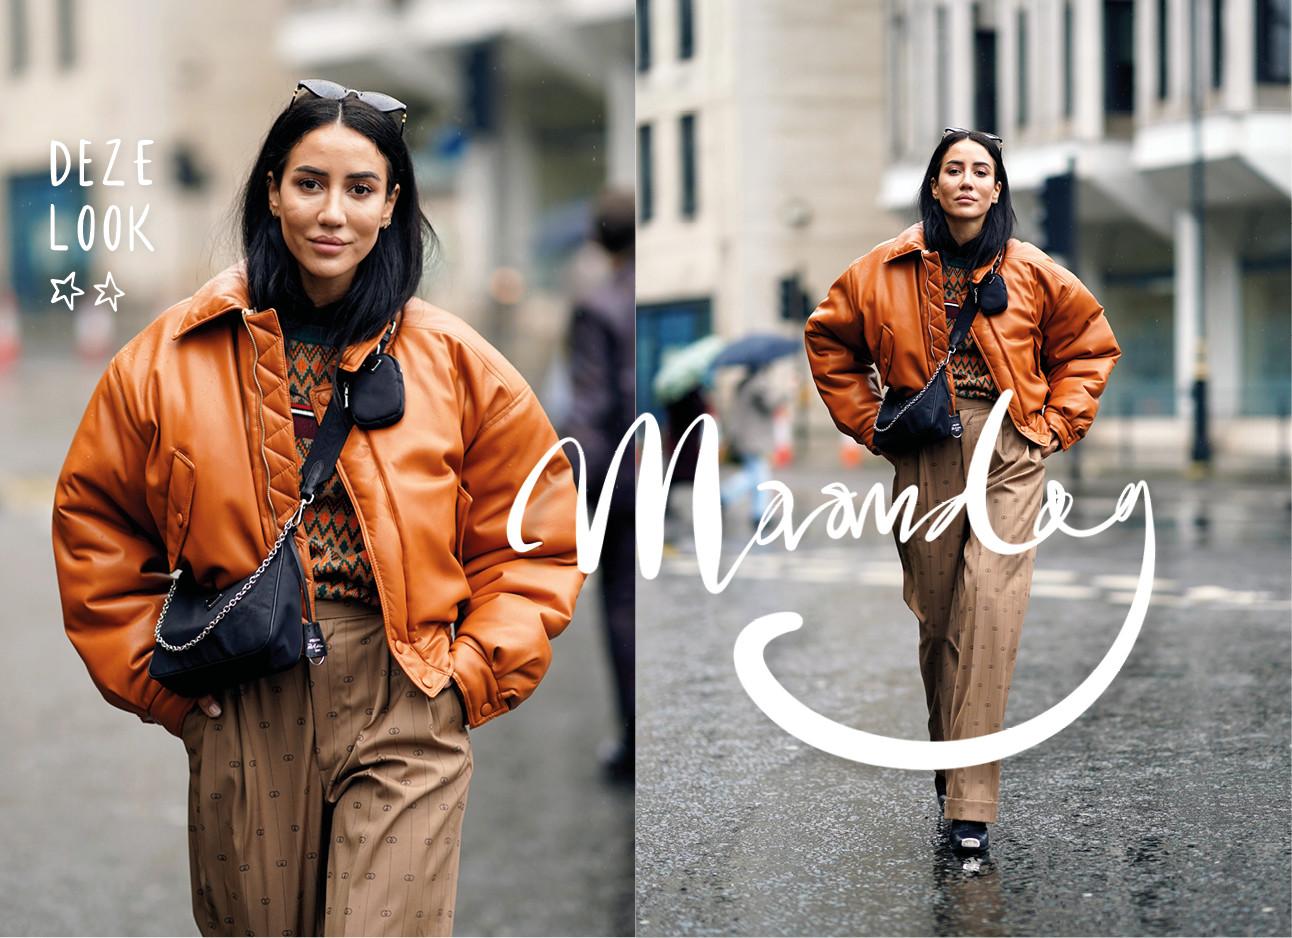 Tamara Kalinic street style foto in oranje puffer